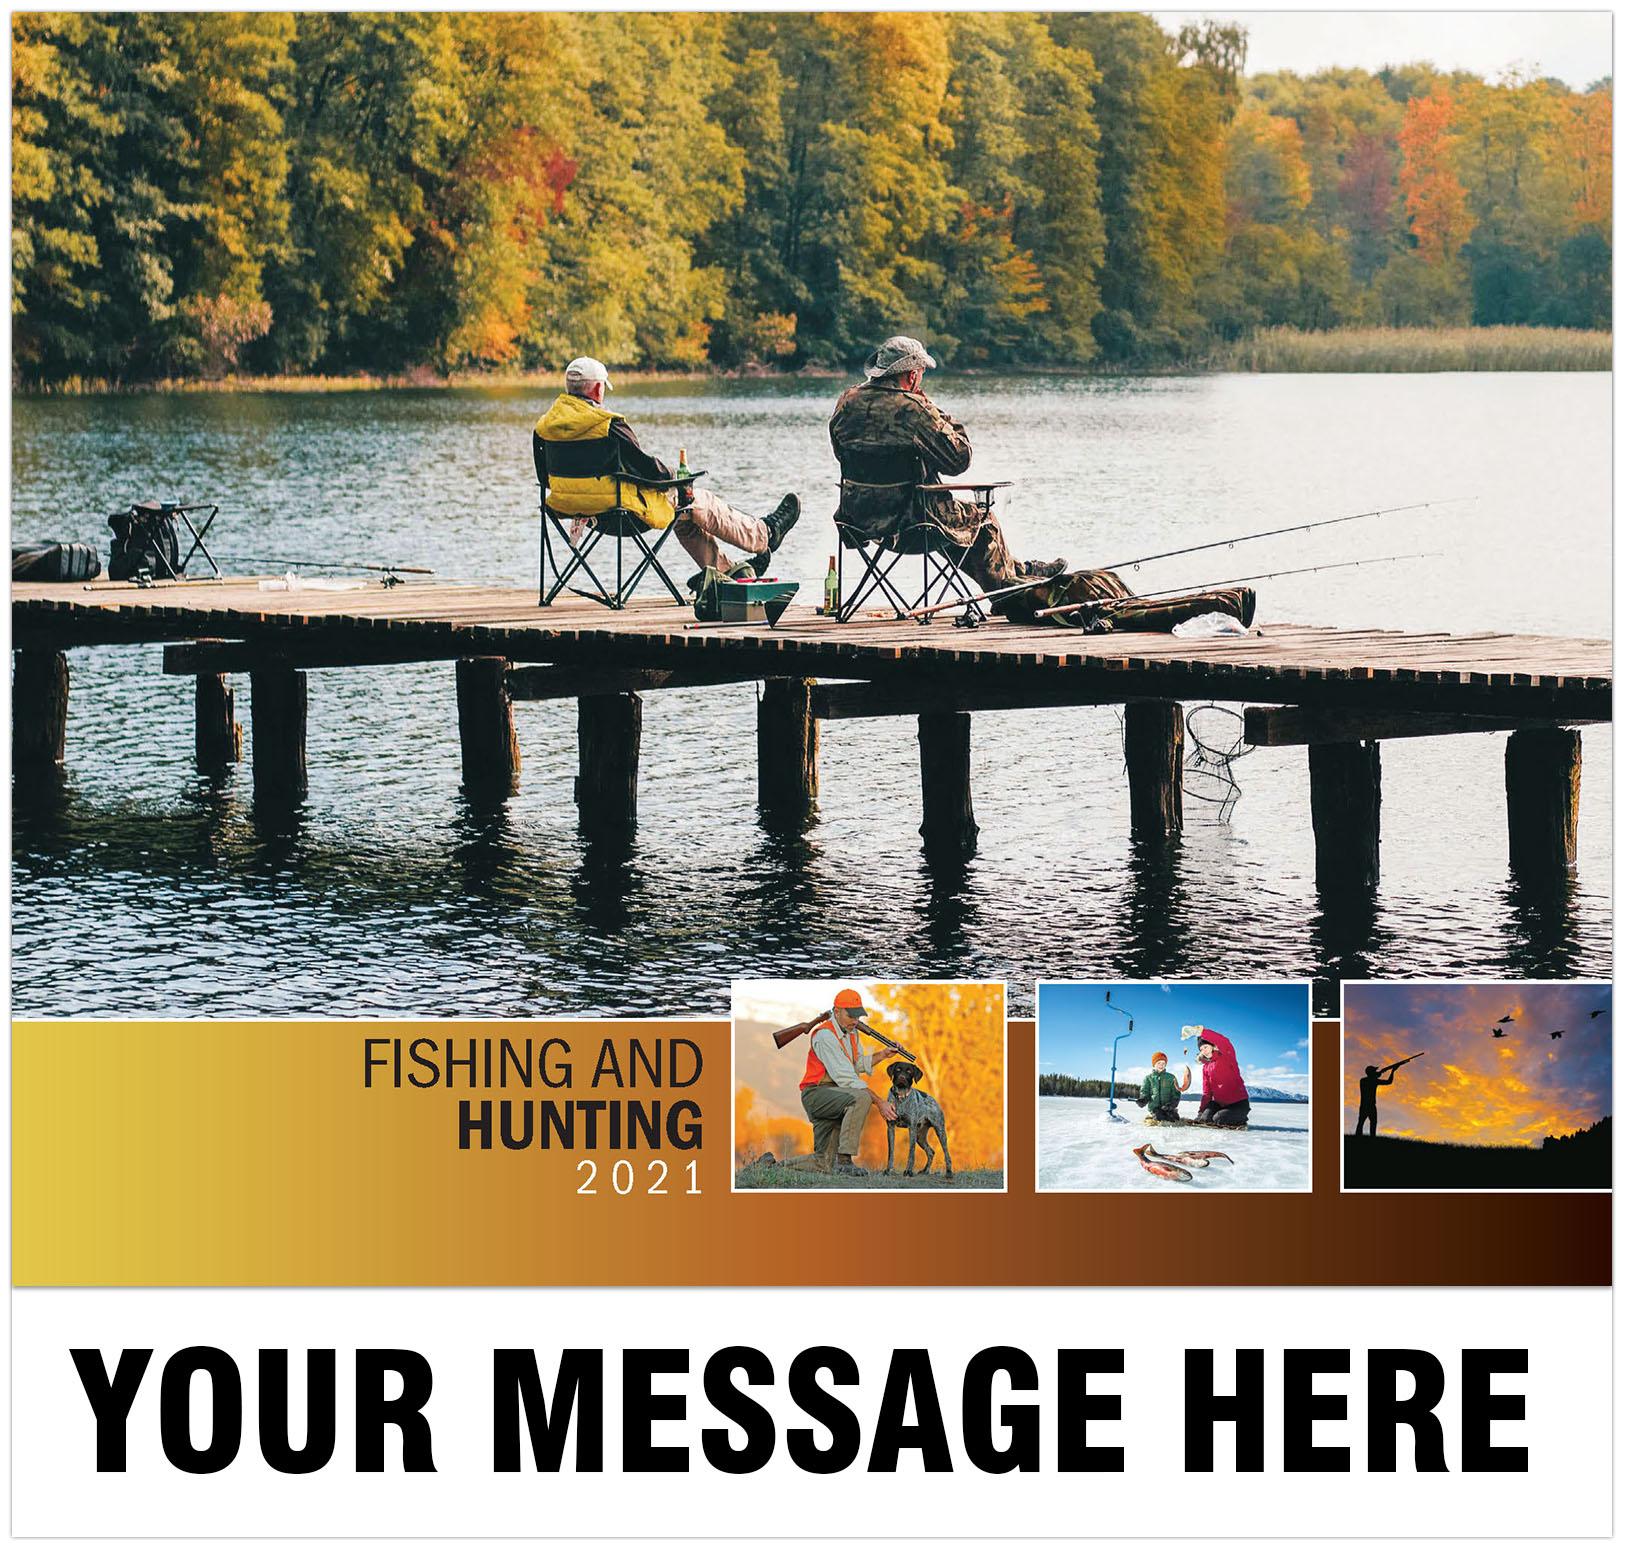 2021 Fishing & Hunting Promotional Calendar